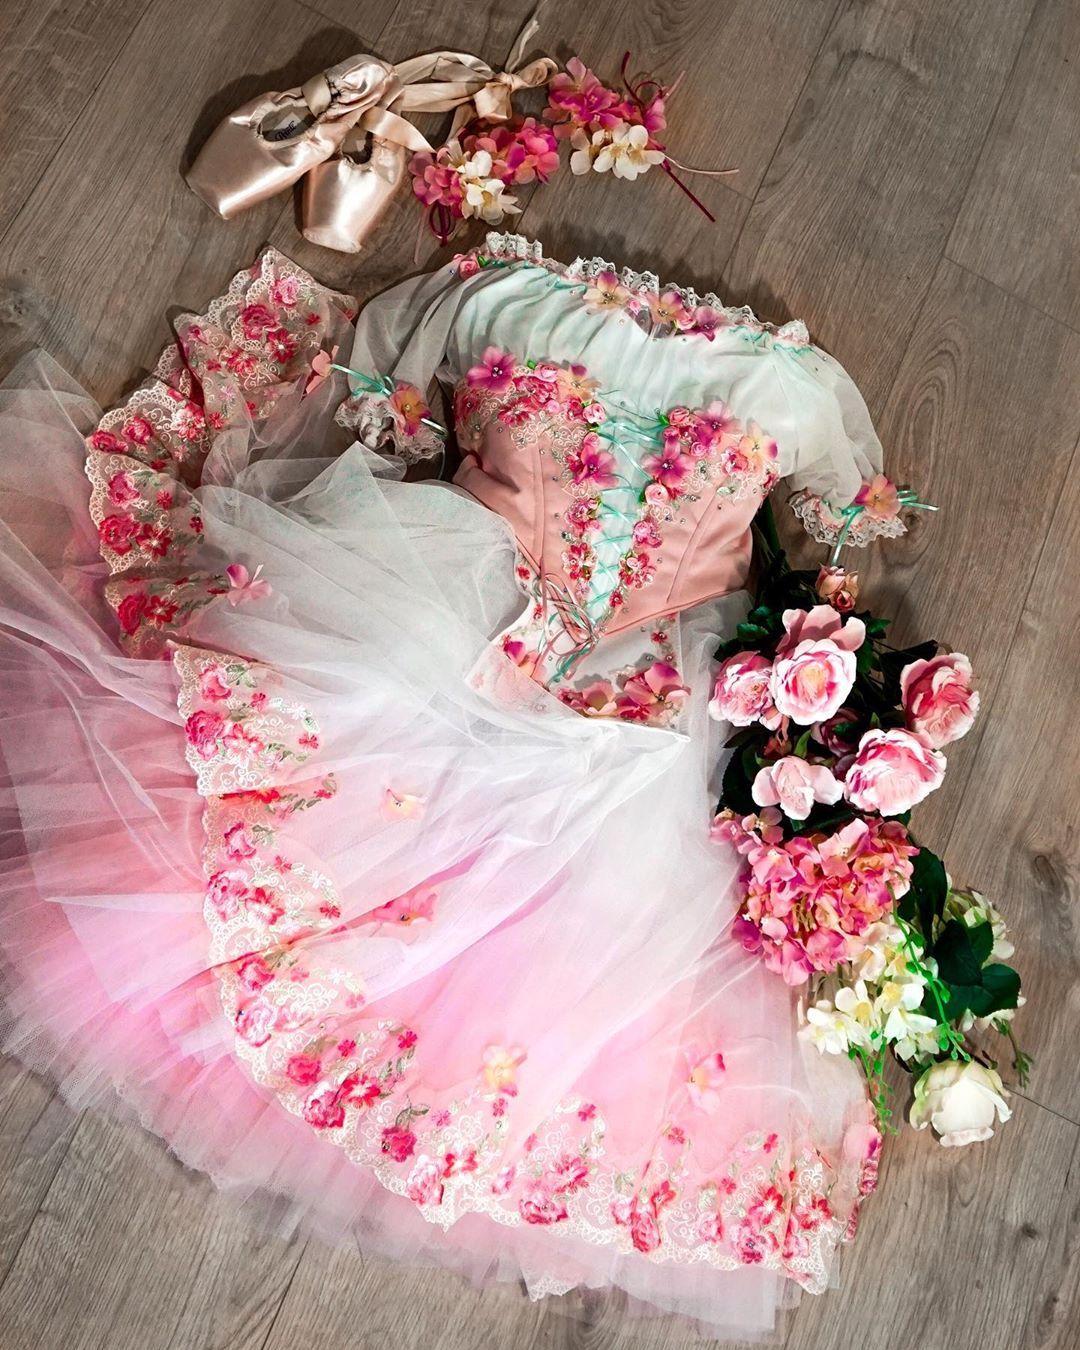 coppelia ballet costumes - Google Search   Coppelia